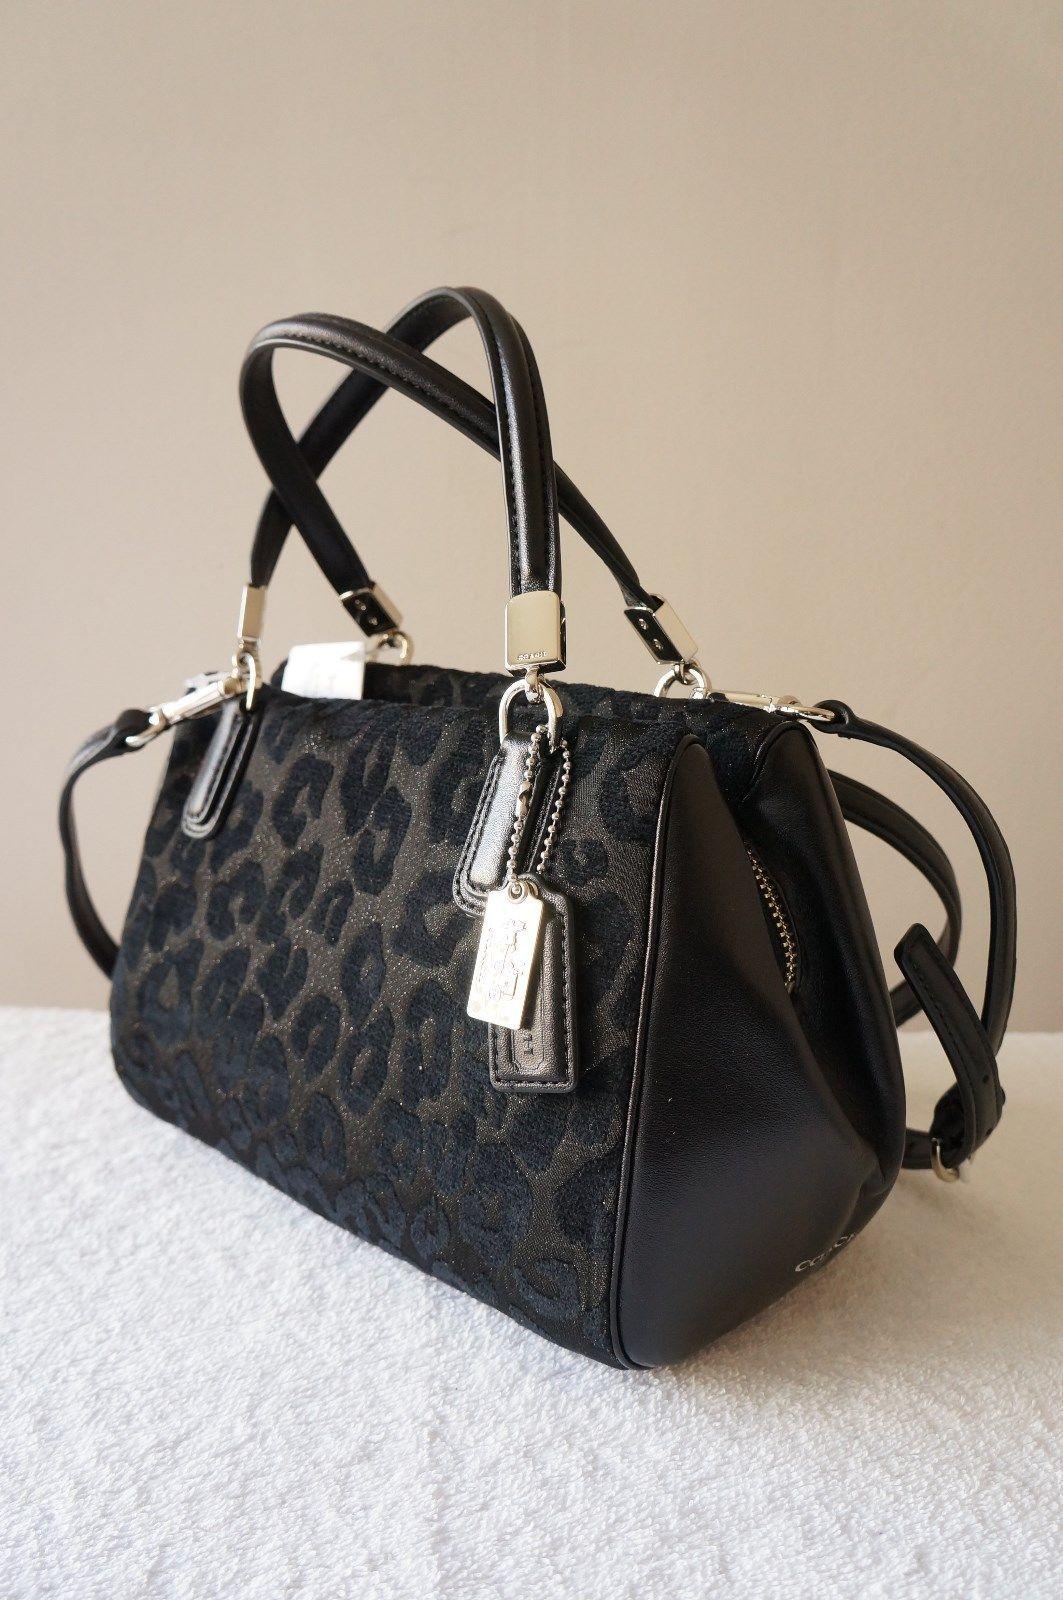 The Chenille Ocelot Mini Satchel from Coach ♡ | Handbags